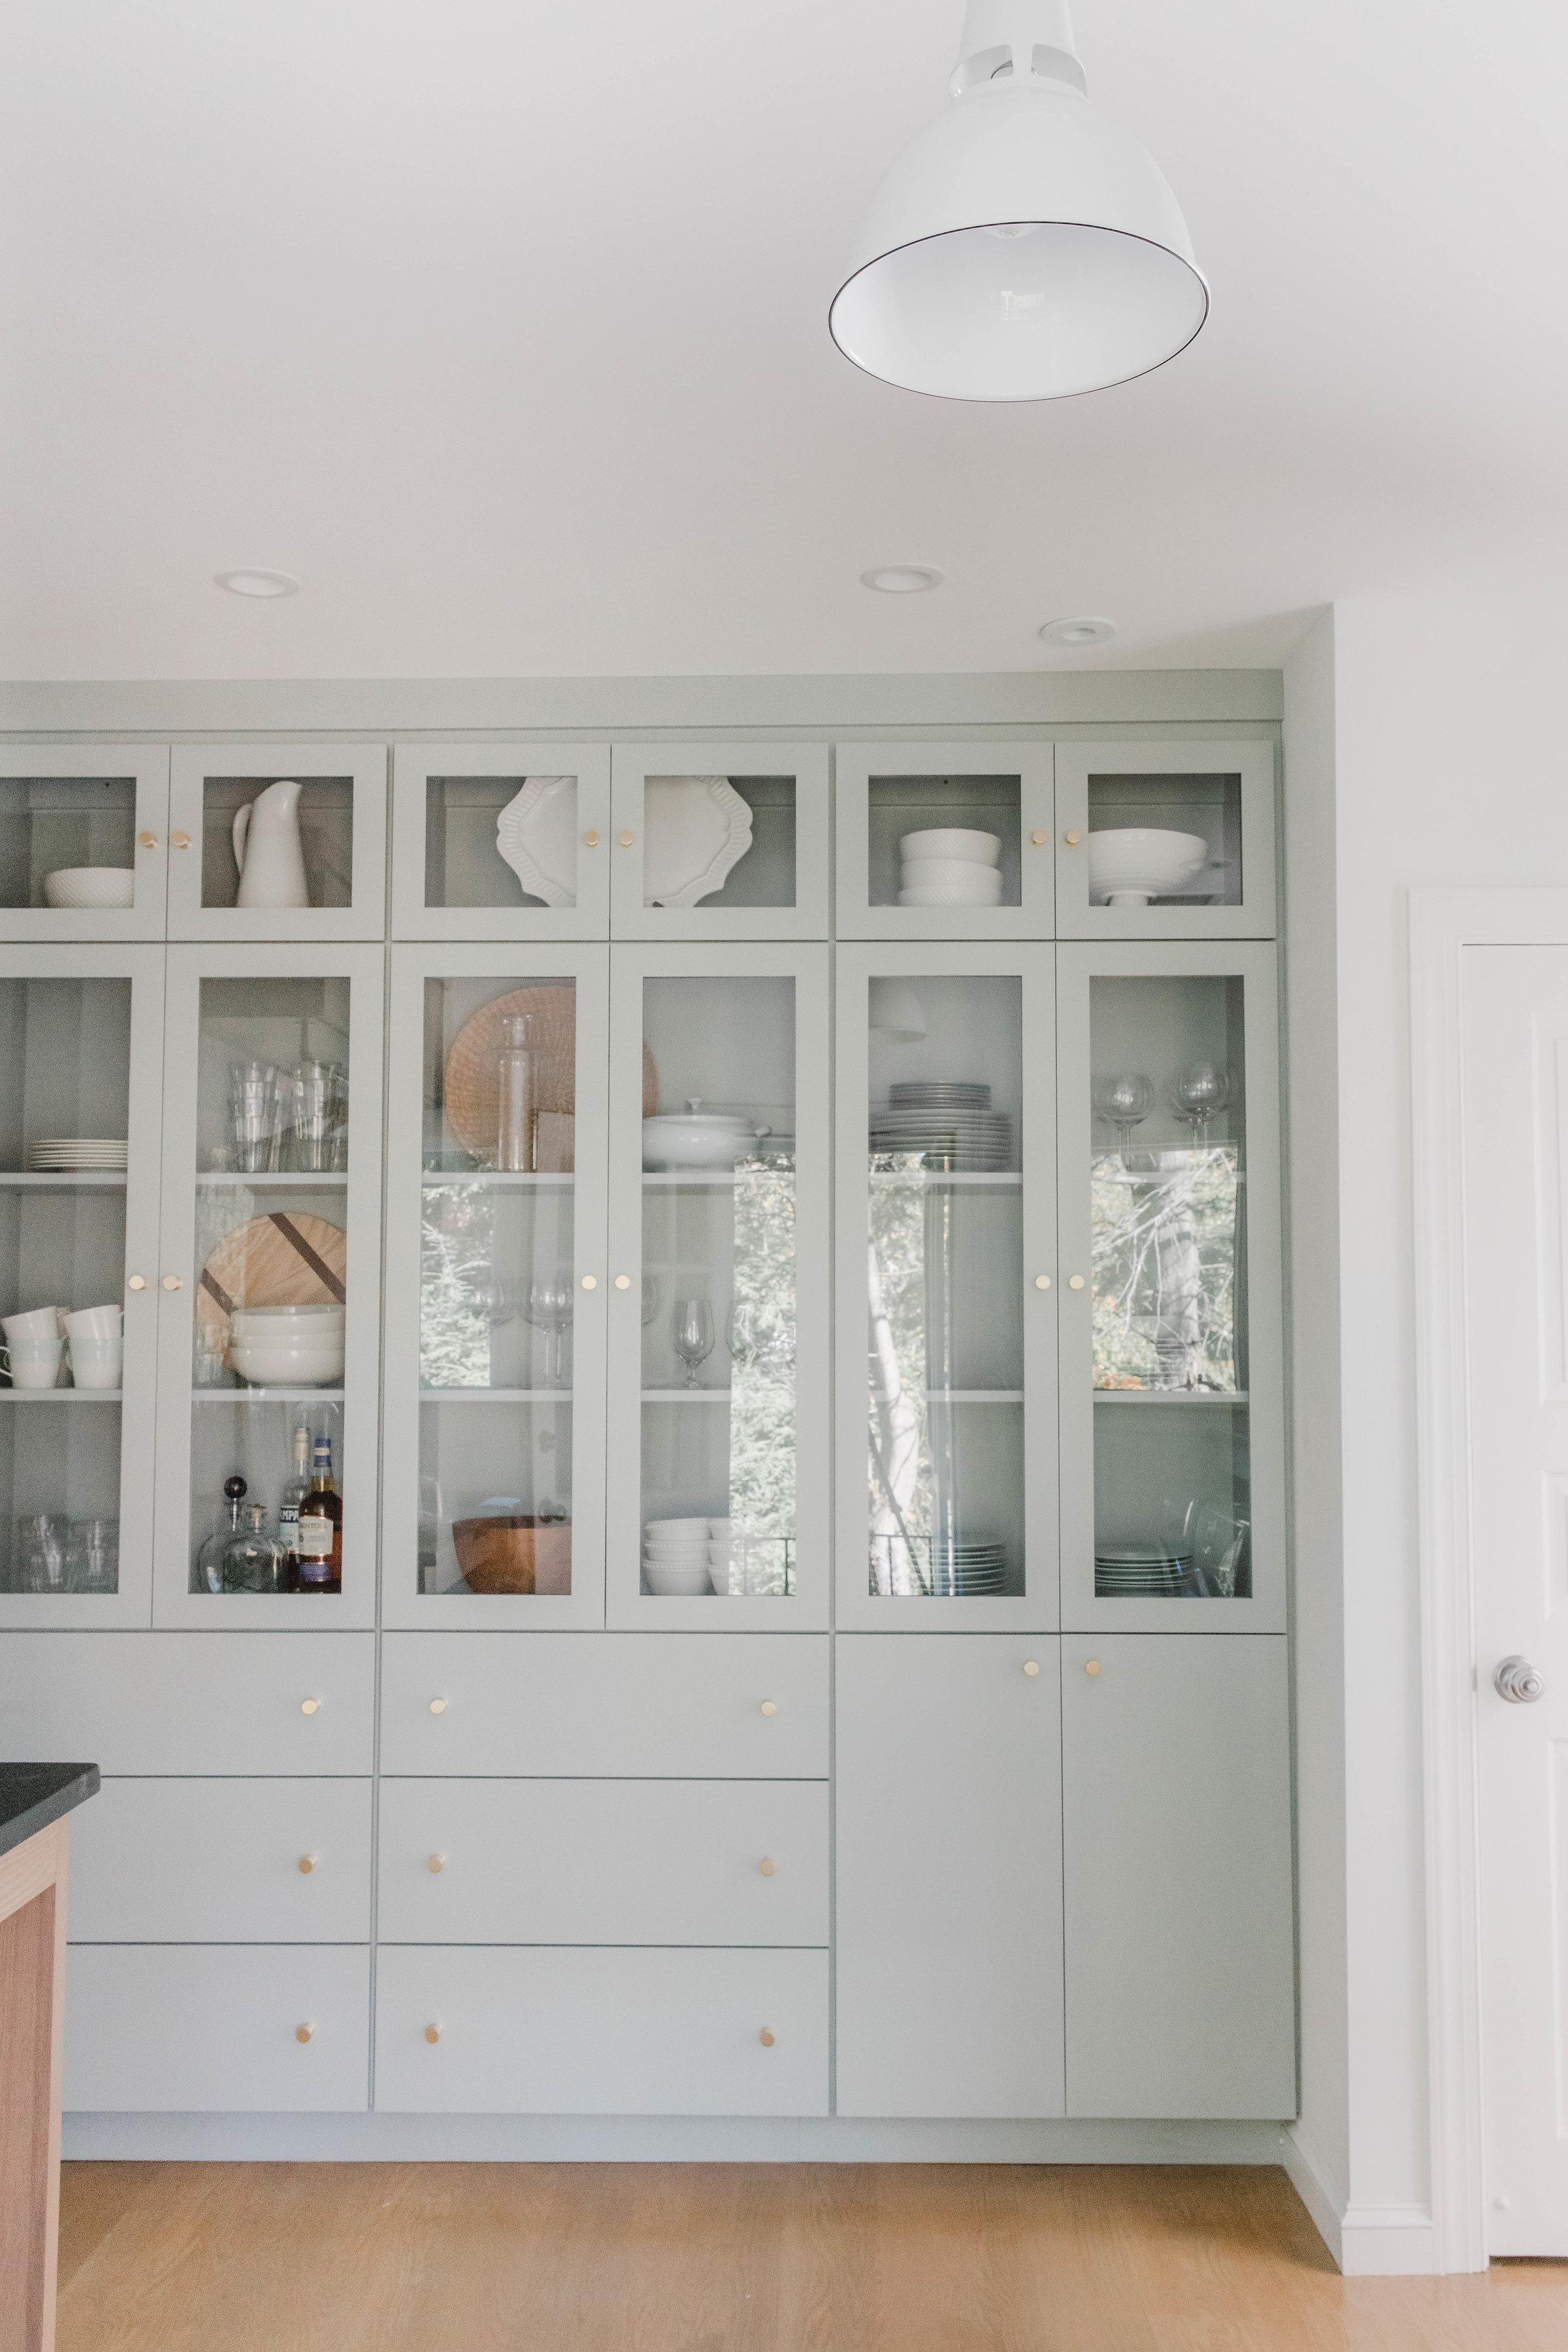 Woodpond Road Kitchen - Rehabitat